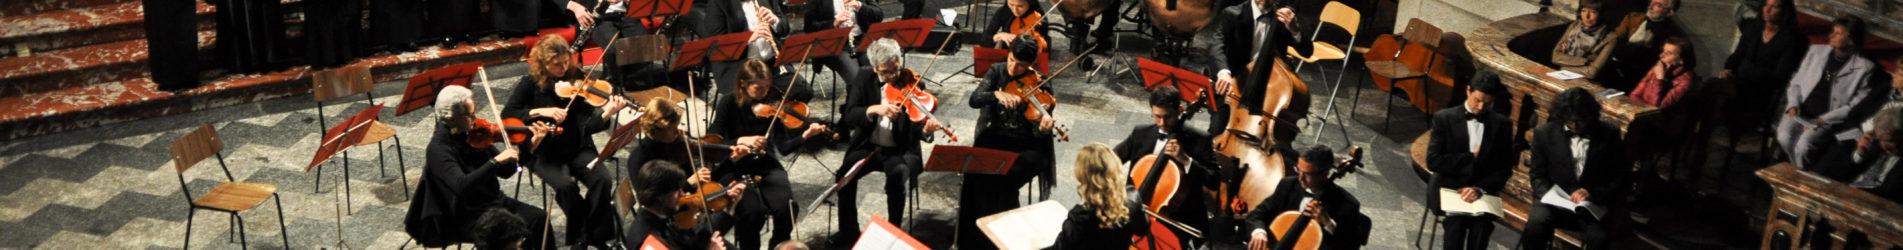 Gallery Concerti Orchestra Ars Armonica